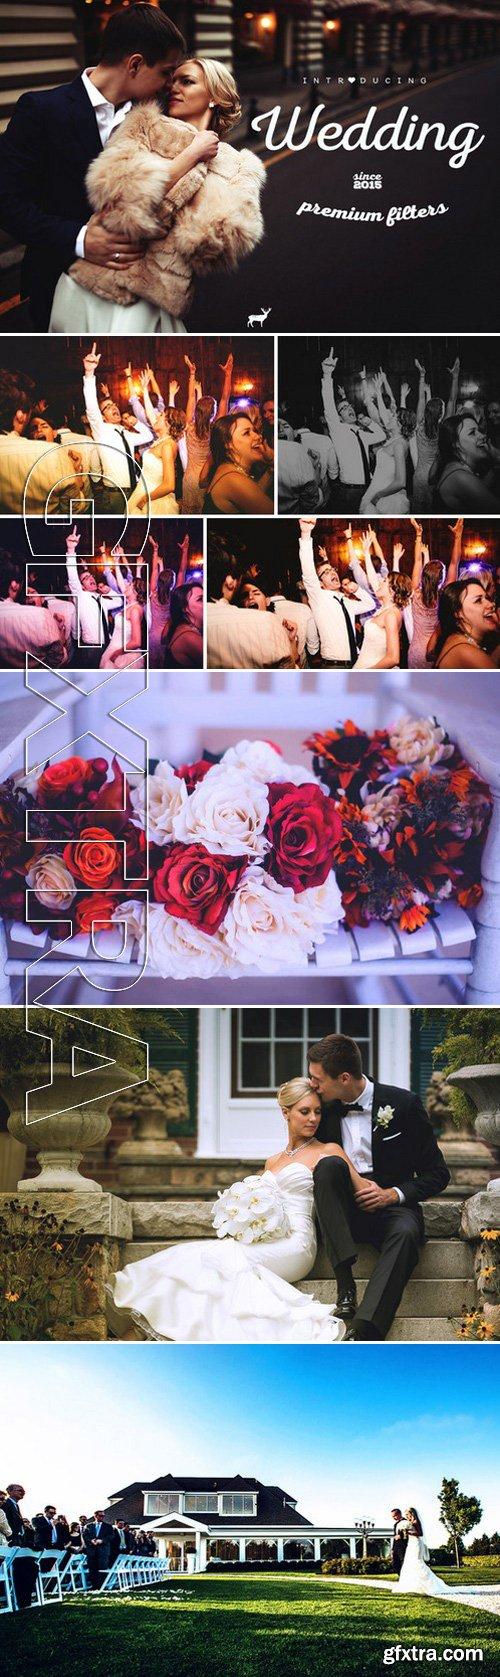 CM - Wedding Premium Filters - PS Actions 417909